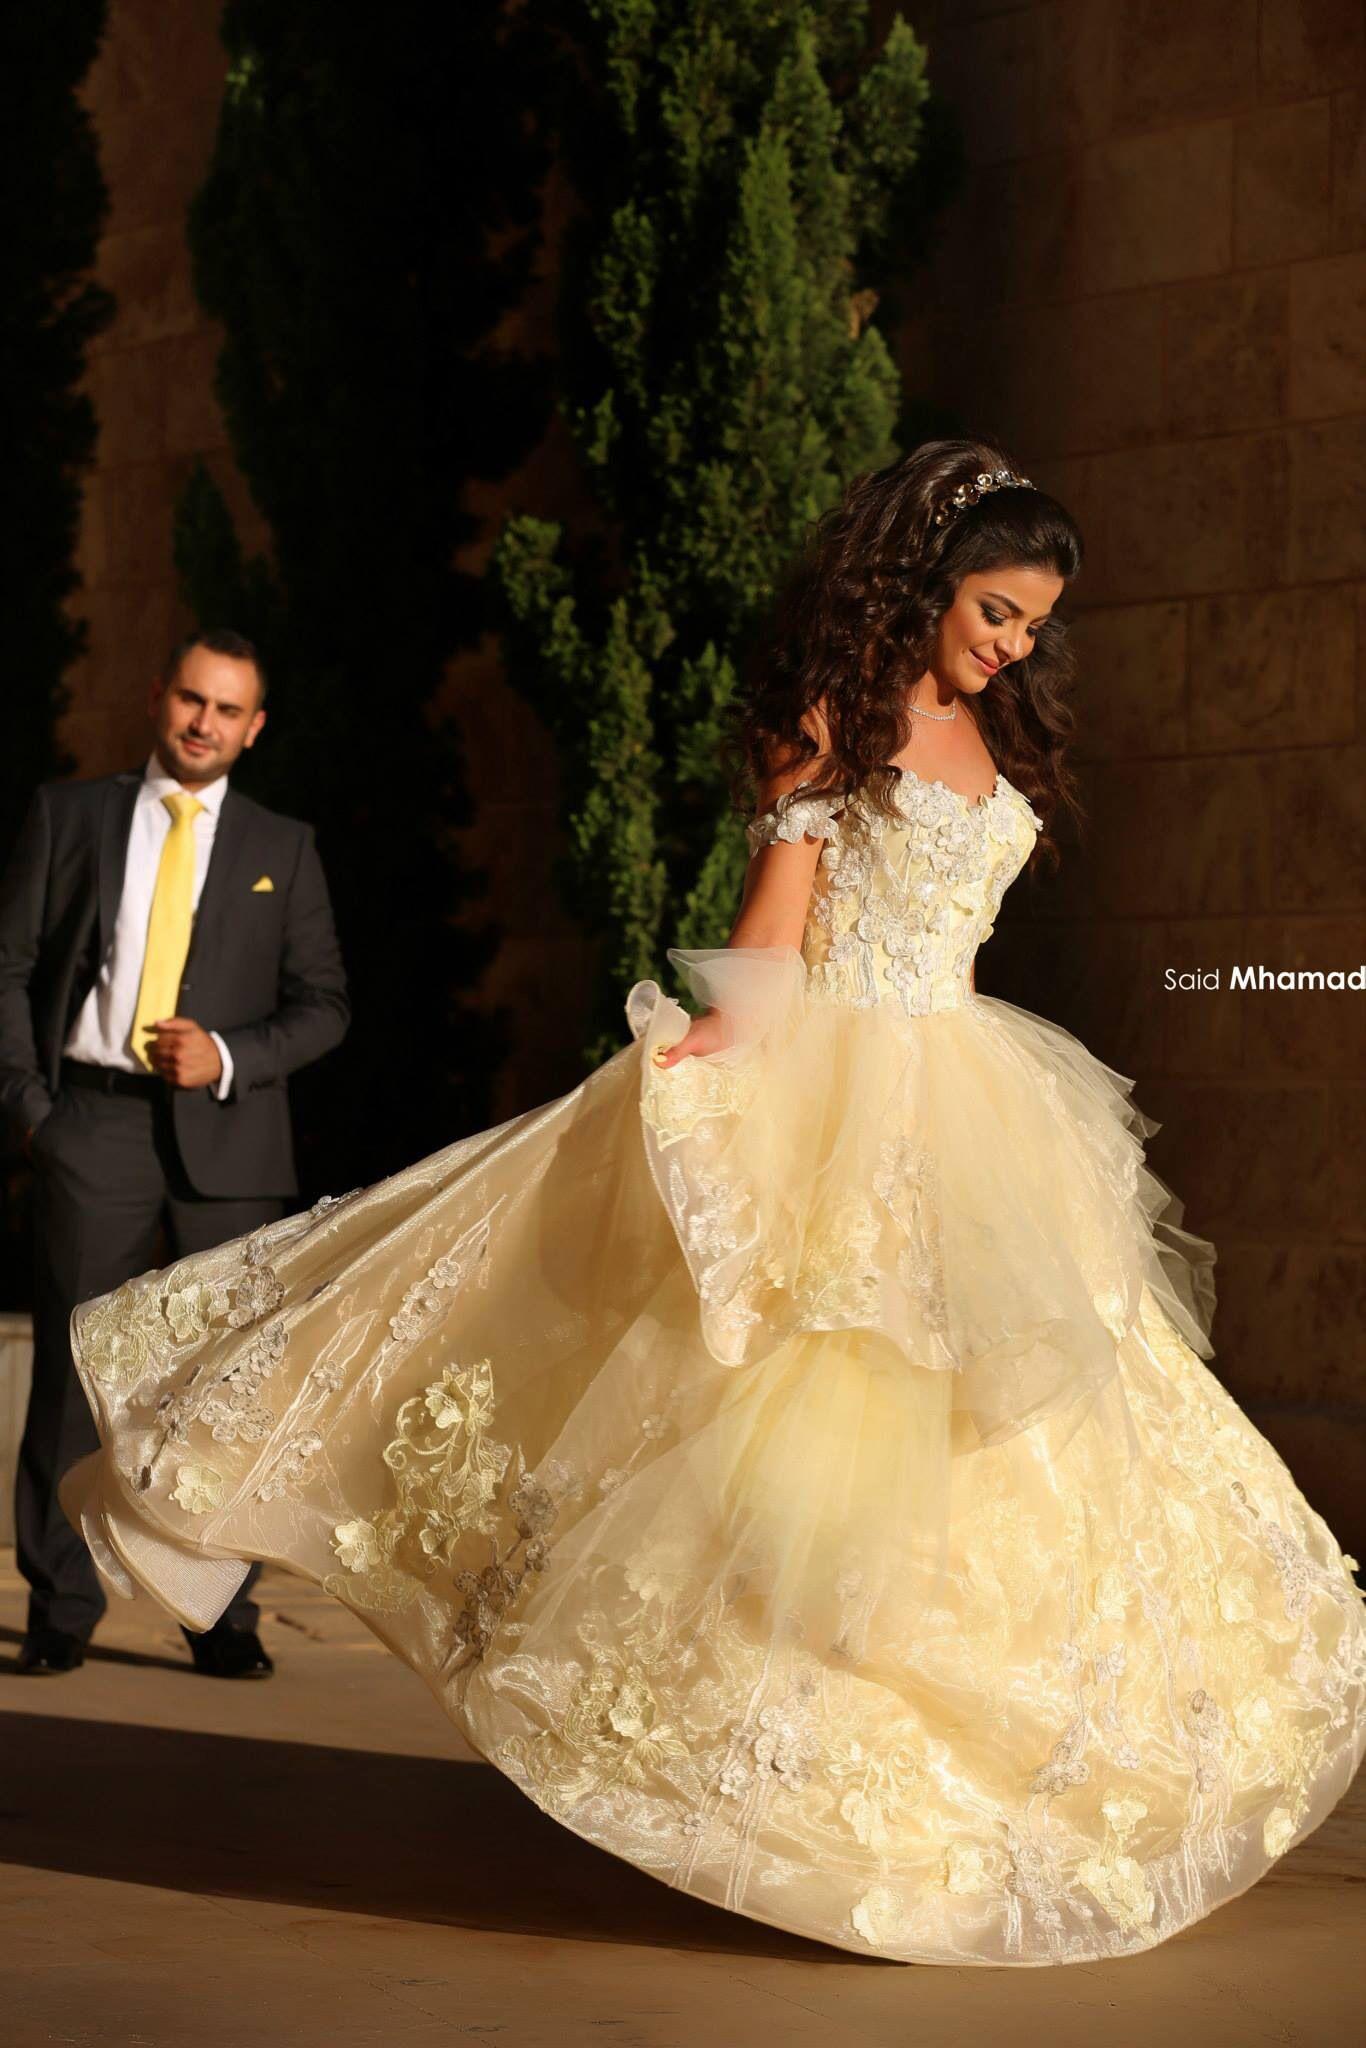 Belle wedding dress said mhamad special day wedding pinterest